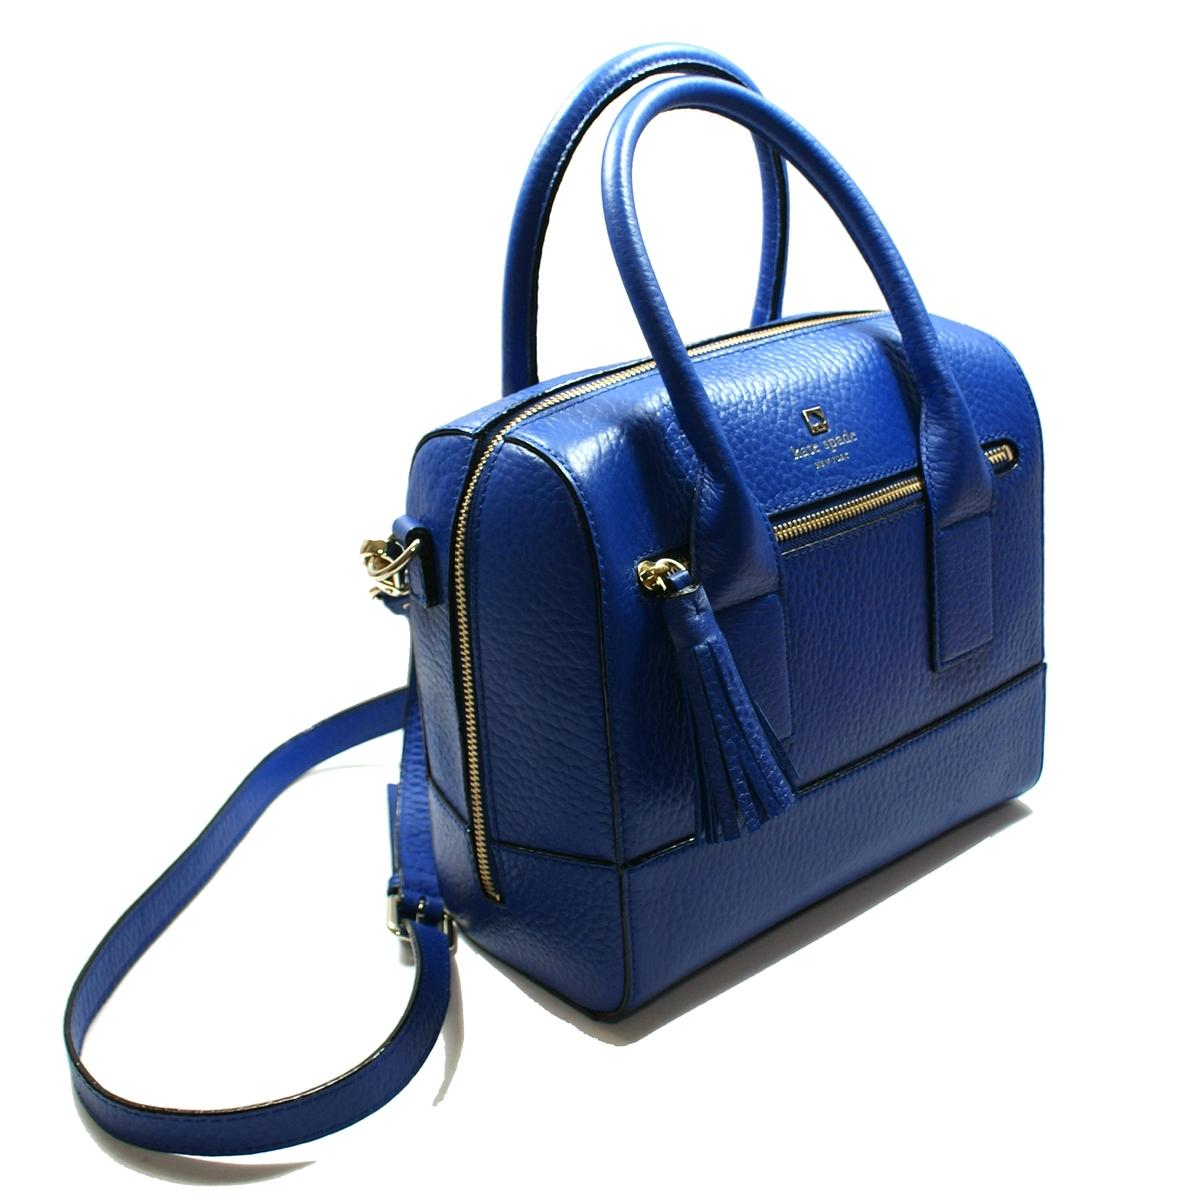 Kate Spade Alessa Southport Avenue Blue Satchel\/ Handbag\/ Crossbody Bag #WKRU1801  Kate Spade